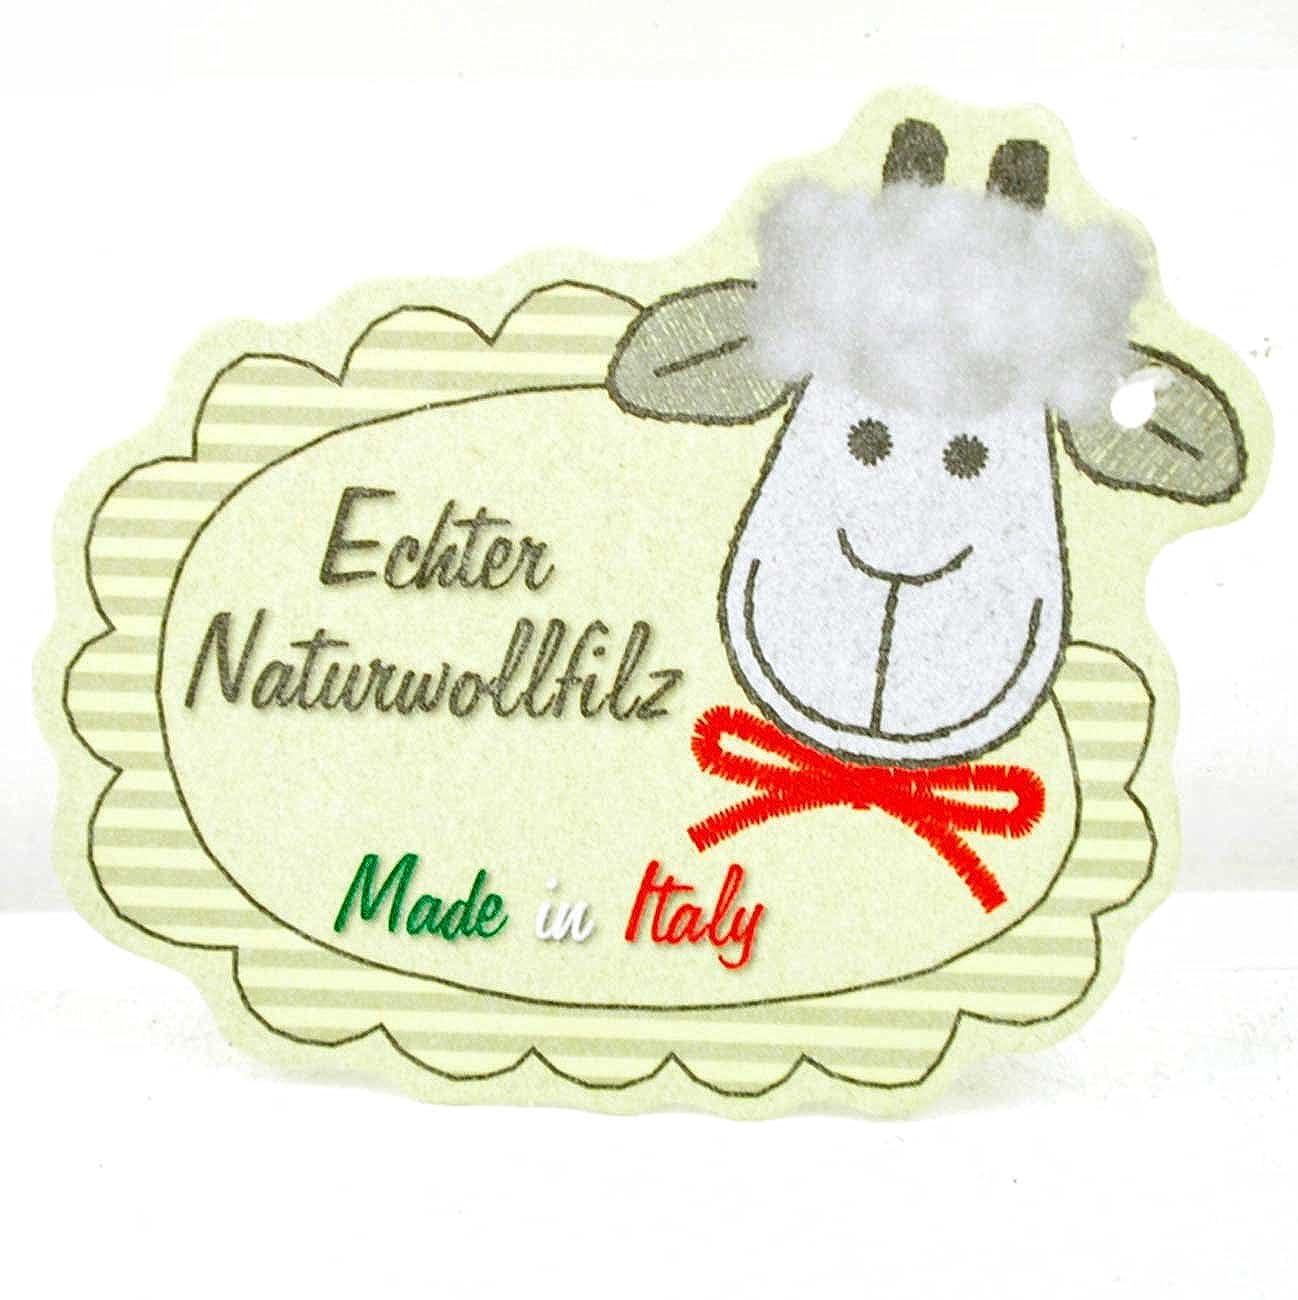 Tofee Damen Hausschuhe, Almrehsi 45029 2 Naturwollfilz grau